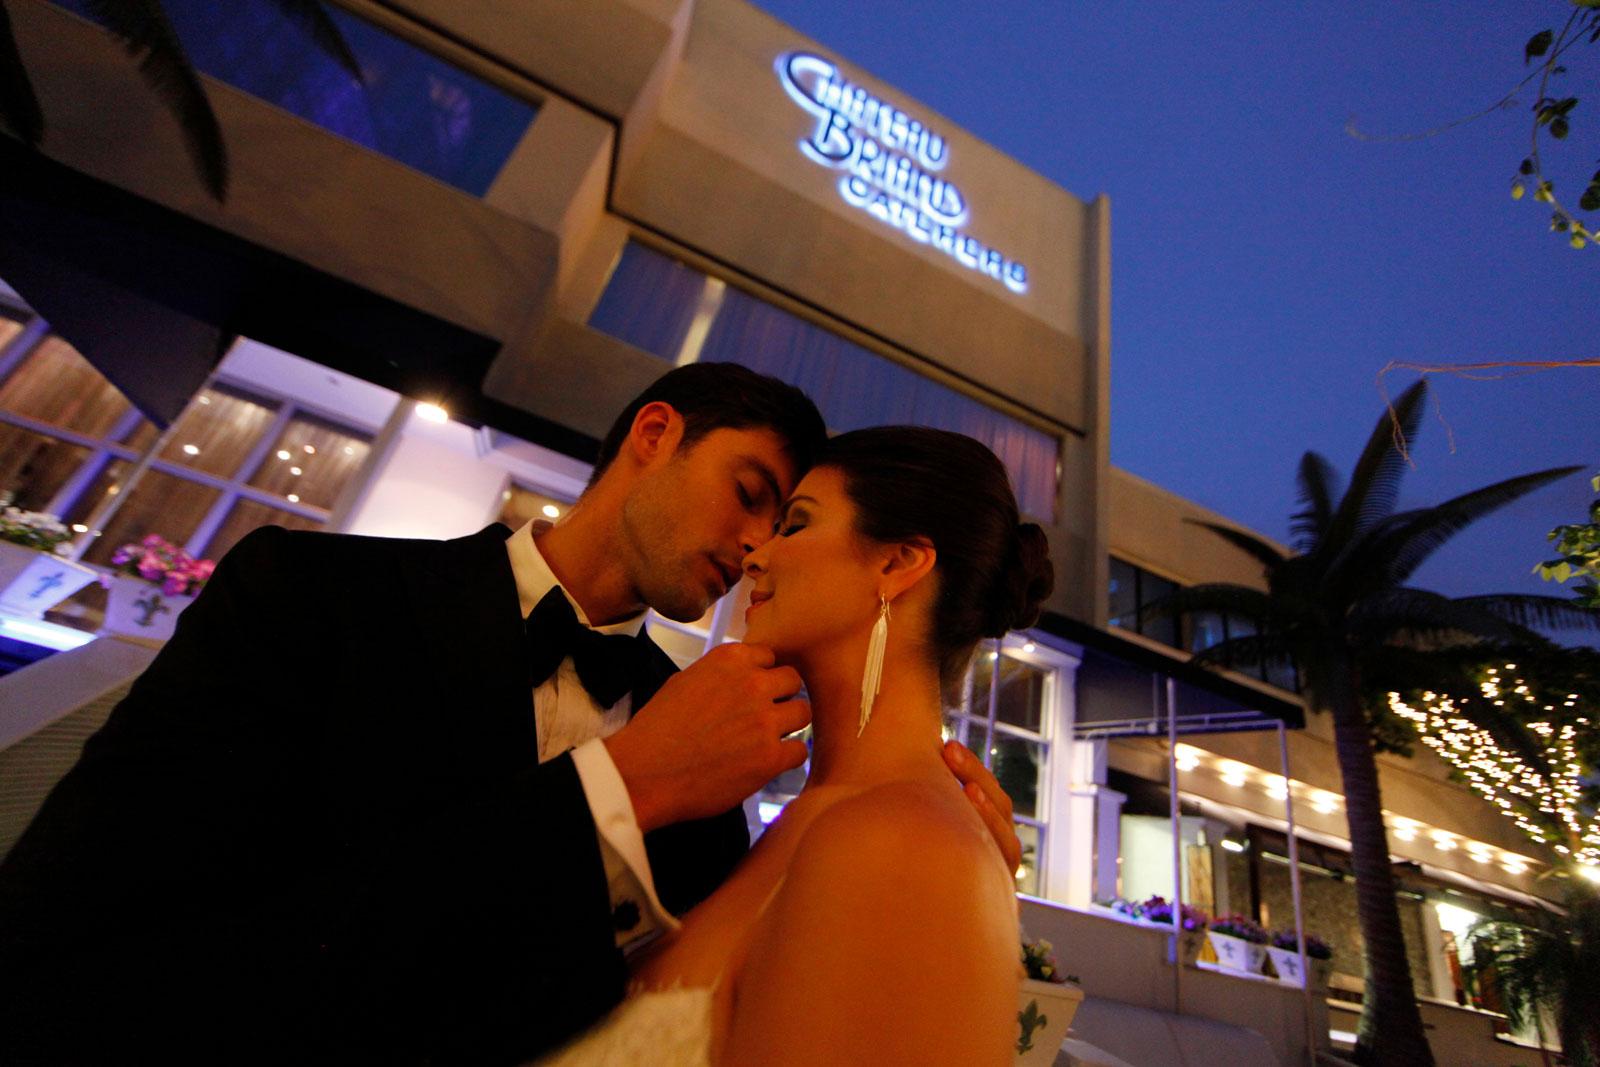 Chateau Briand Couple Kissing